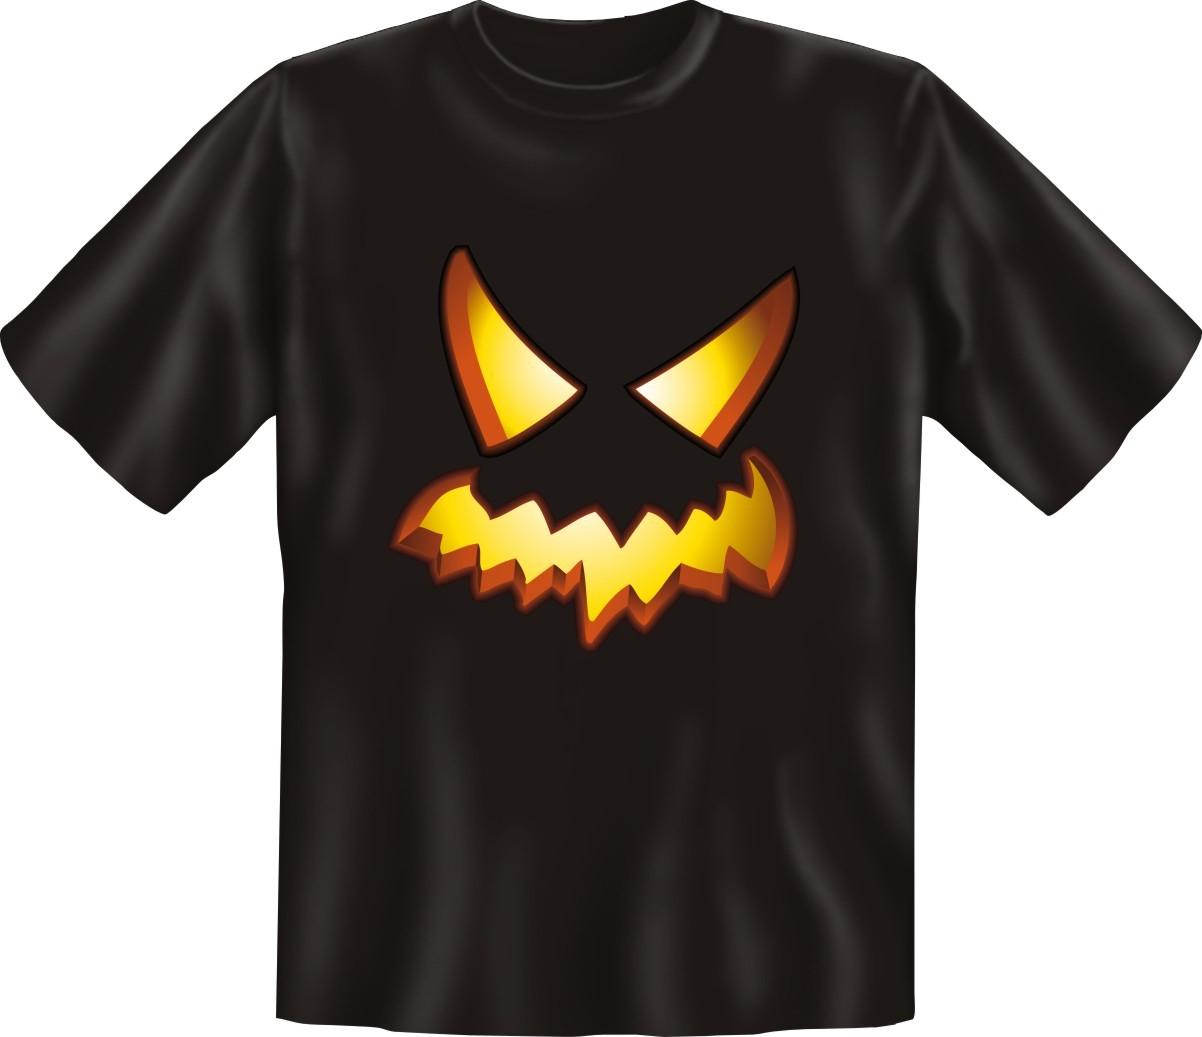 halloween shop mit gro er auswahl an halloween shirts. Black Bedroom Furniture Sets. Home Design Ideas